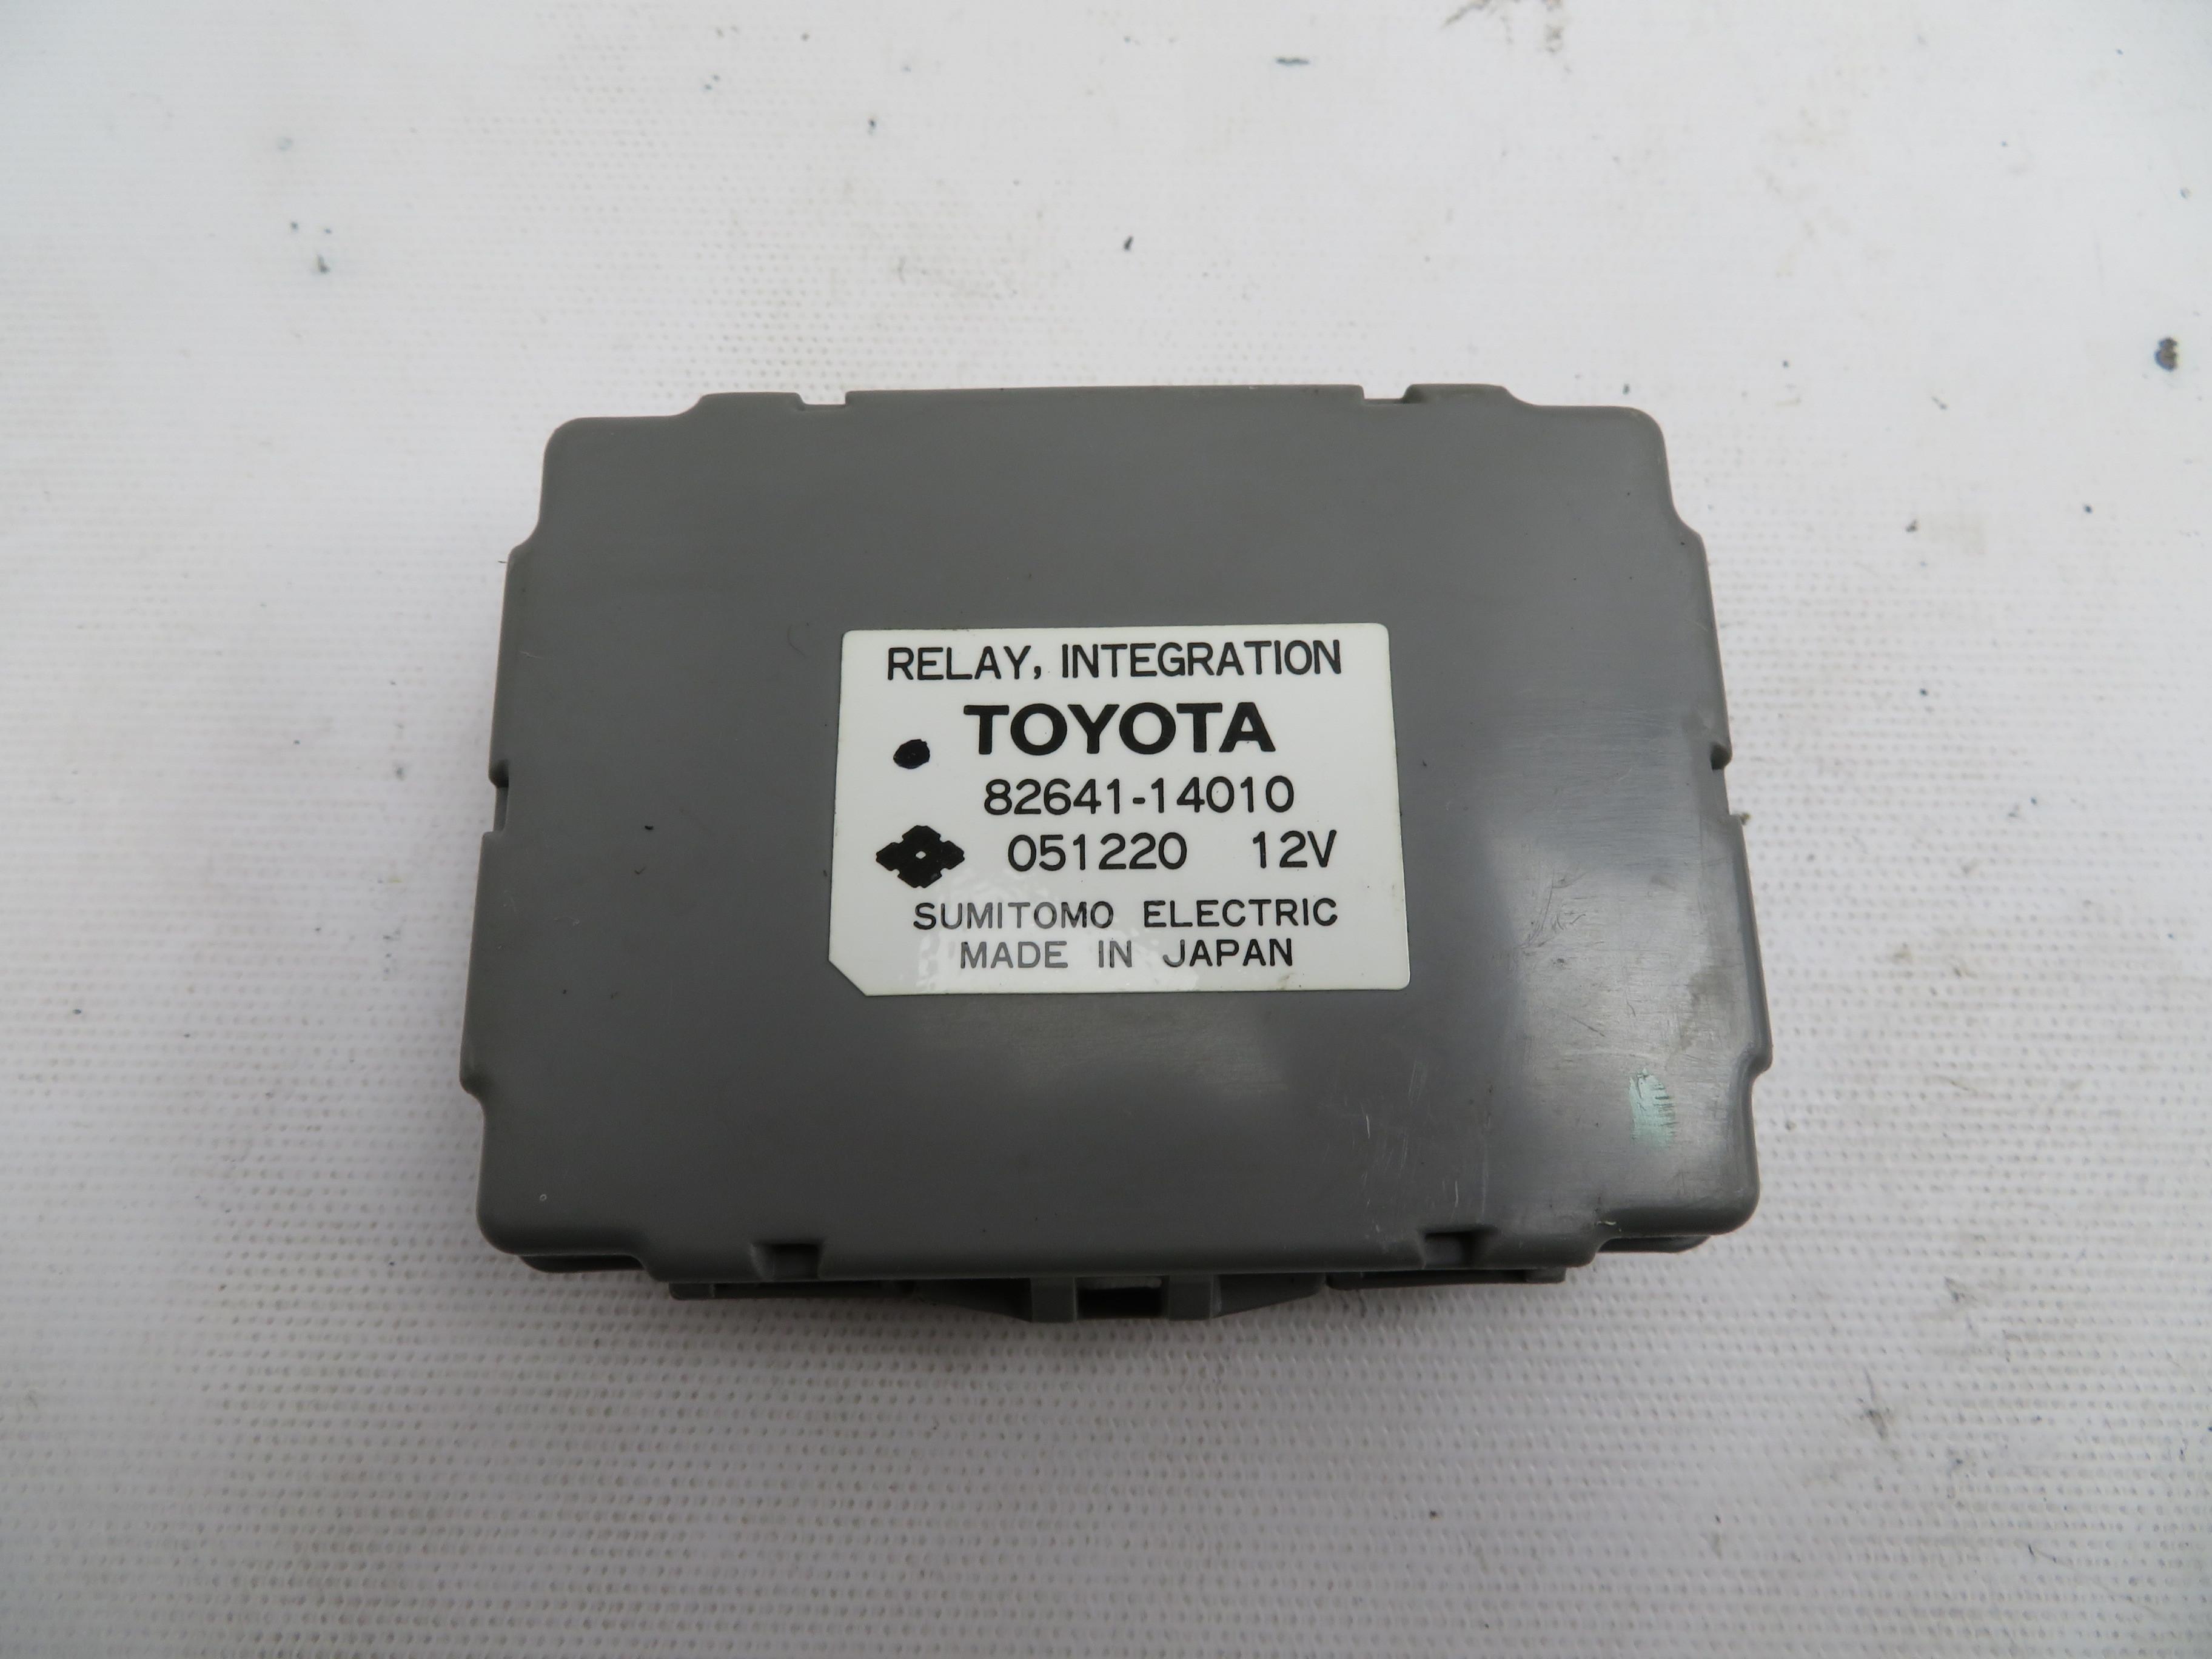 supra fuse box 86 92 toyota supra turbo mk3 1098 relay fuse box integration oem  86 92 toyota supra turbo mk3 1098